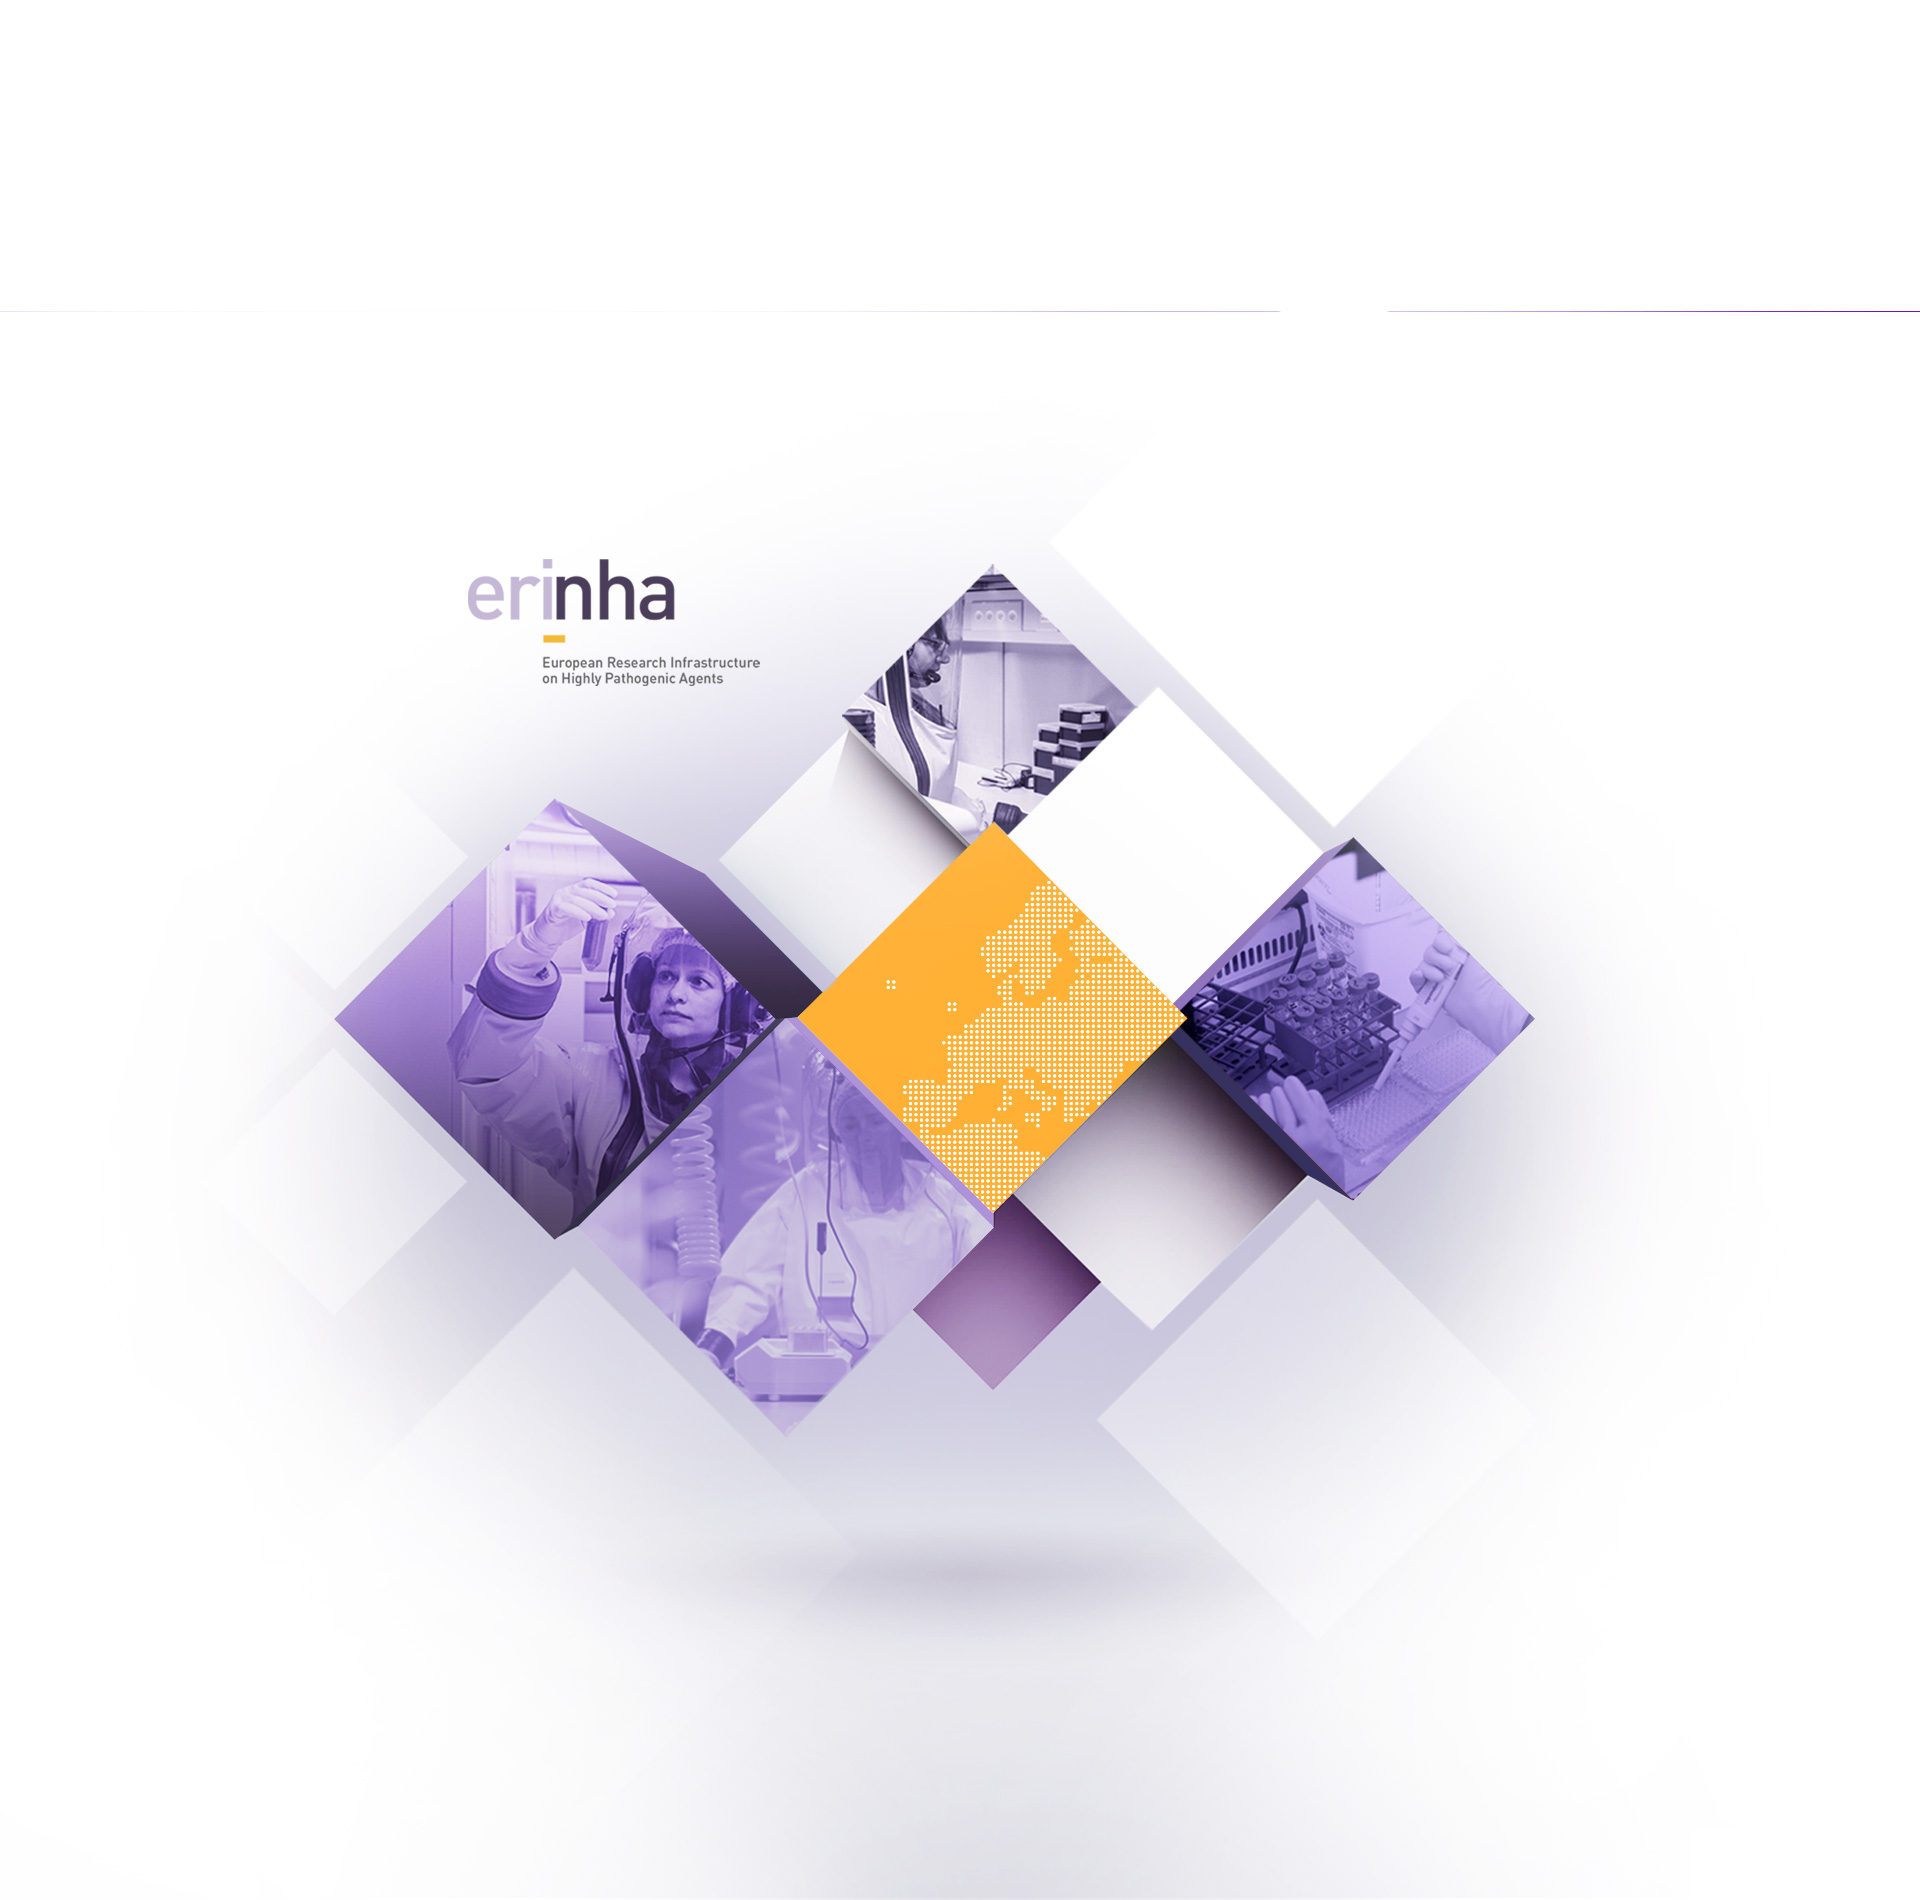 Erinha